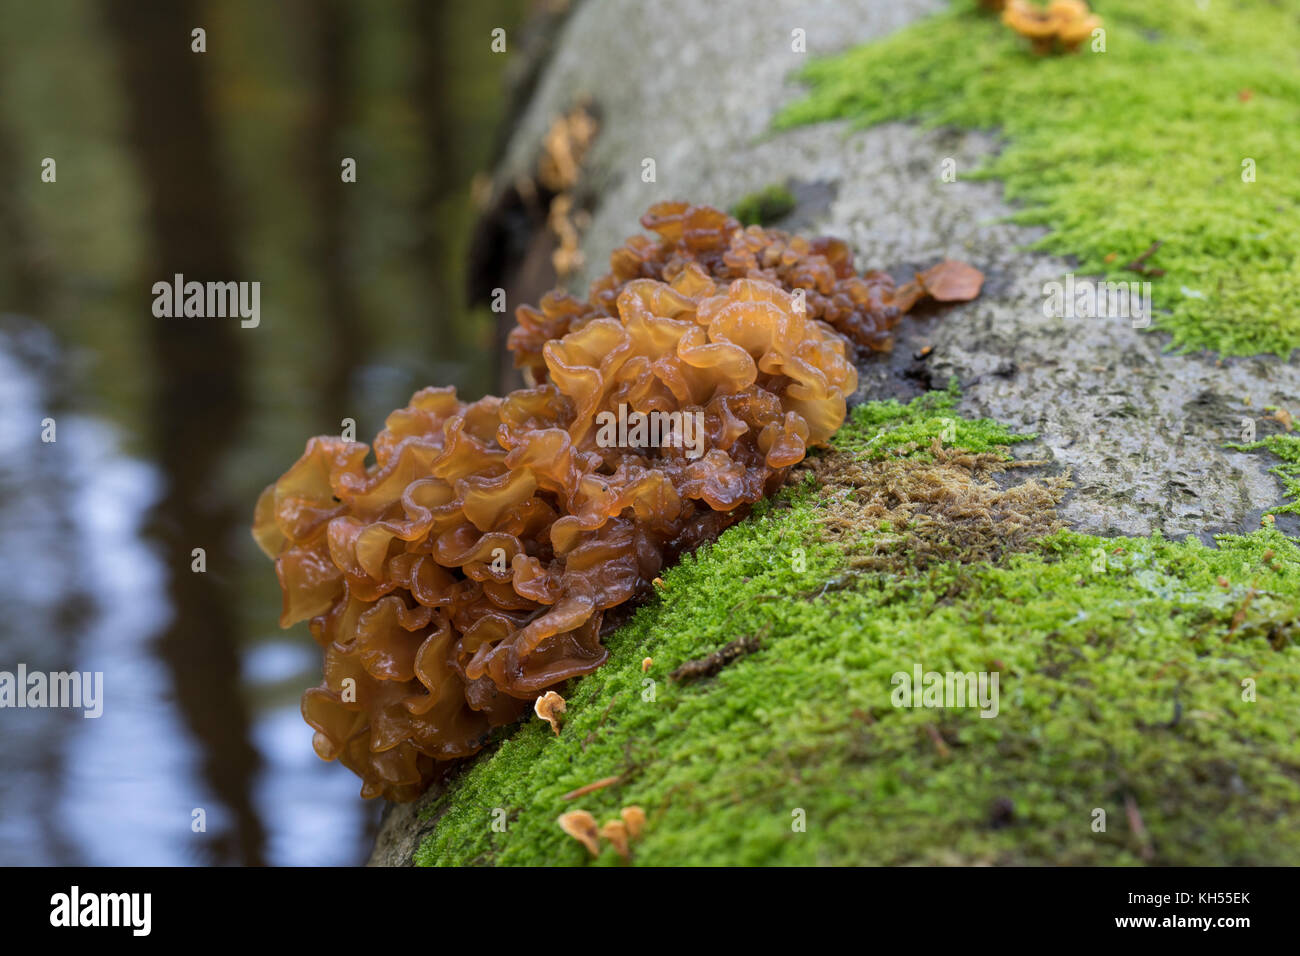 Rotbrauner Zitterling, Blattartiger Zitterling, Tremella foliacea, Pseudotremella pseudofoliacea, Exidia foliacea, - Stock Image